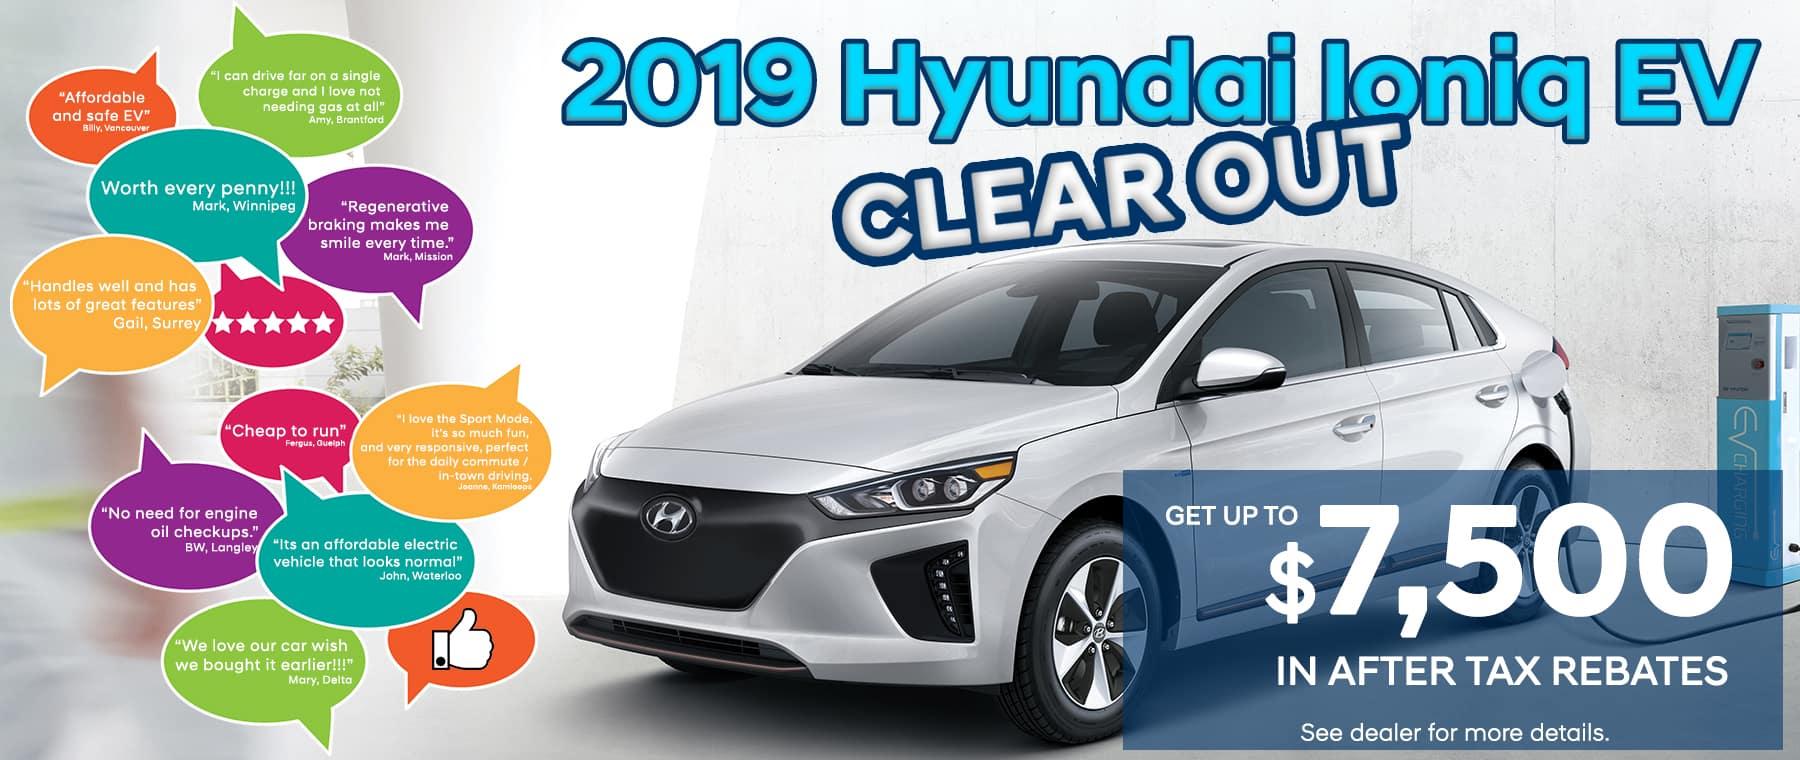 Focus Hyundai in Winnipeg, MB | New and Used Cars